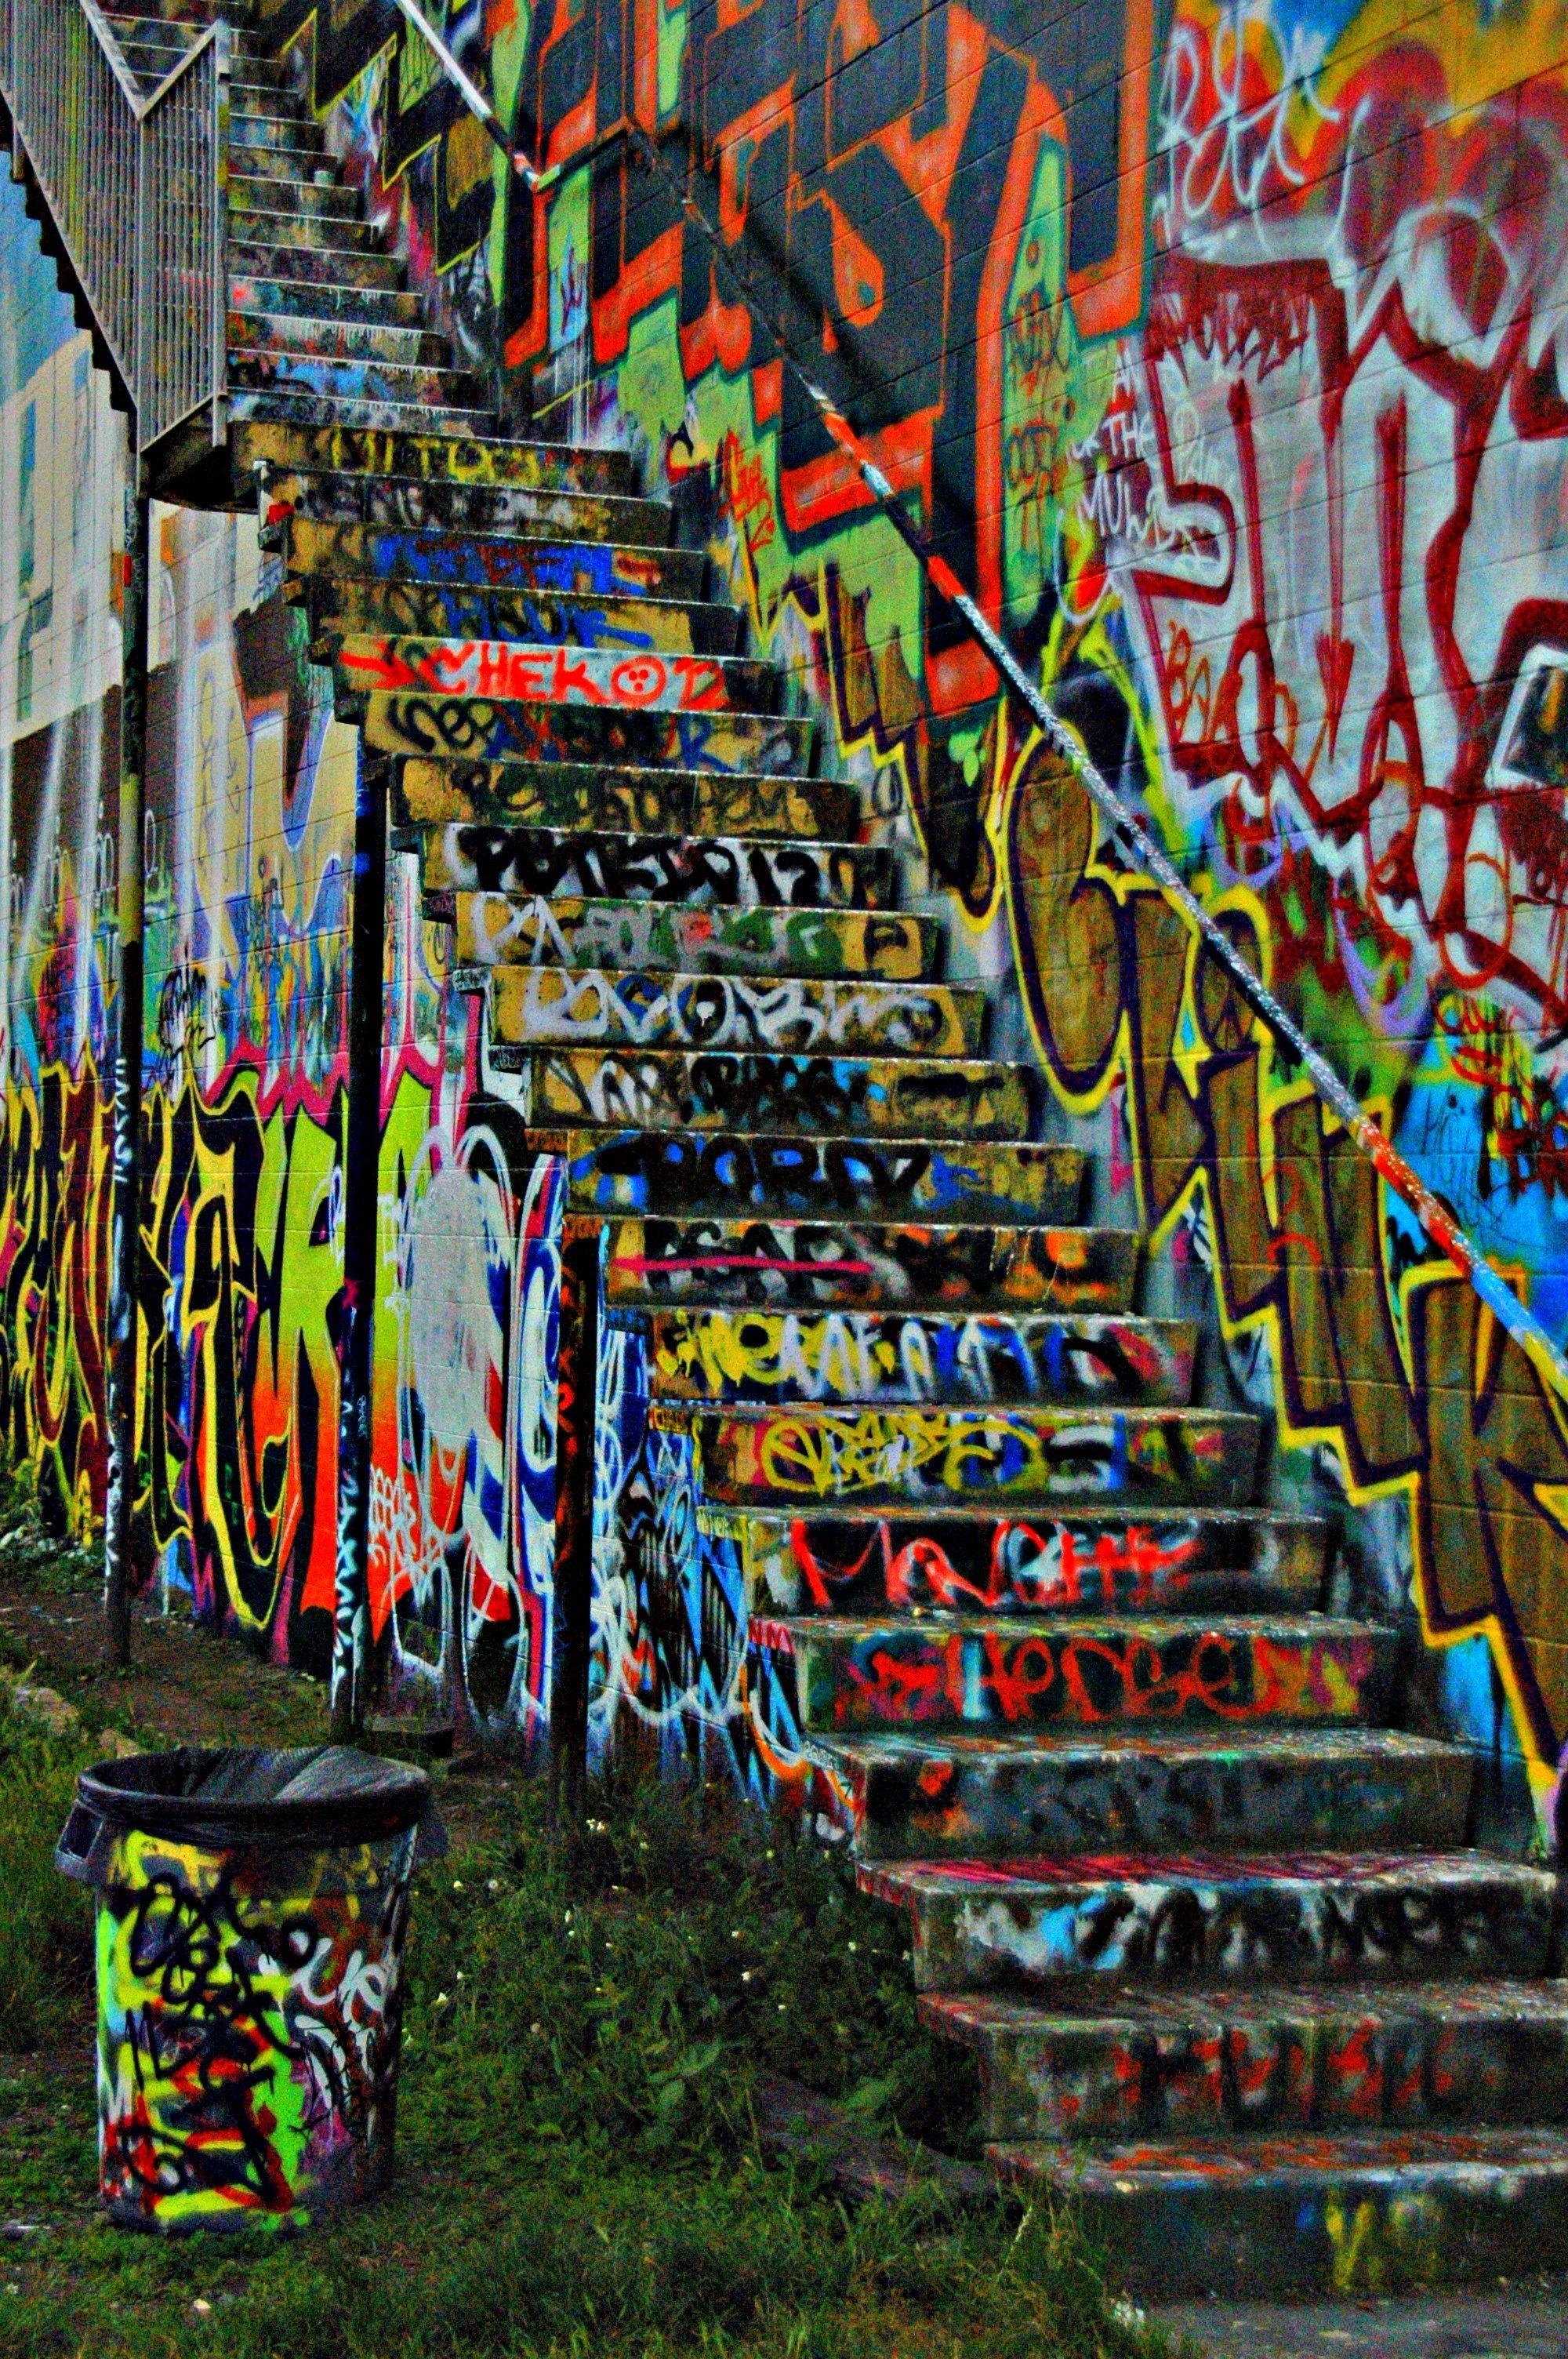 Graffiti Wall In Seattle!!:3 | My Pictures:) | Pinterest | Graffiti Inside Graffiti Wall Art (View 6 of 20)